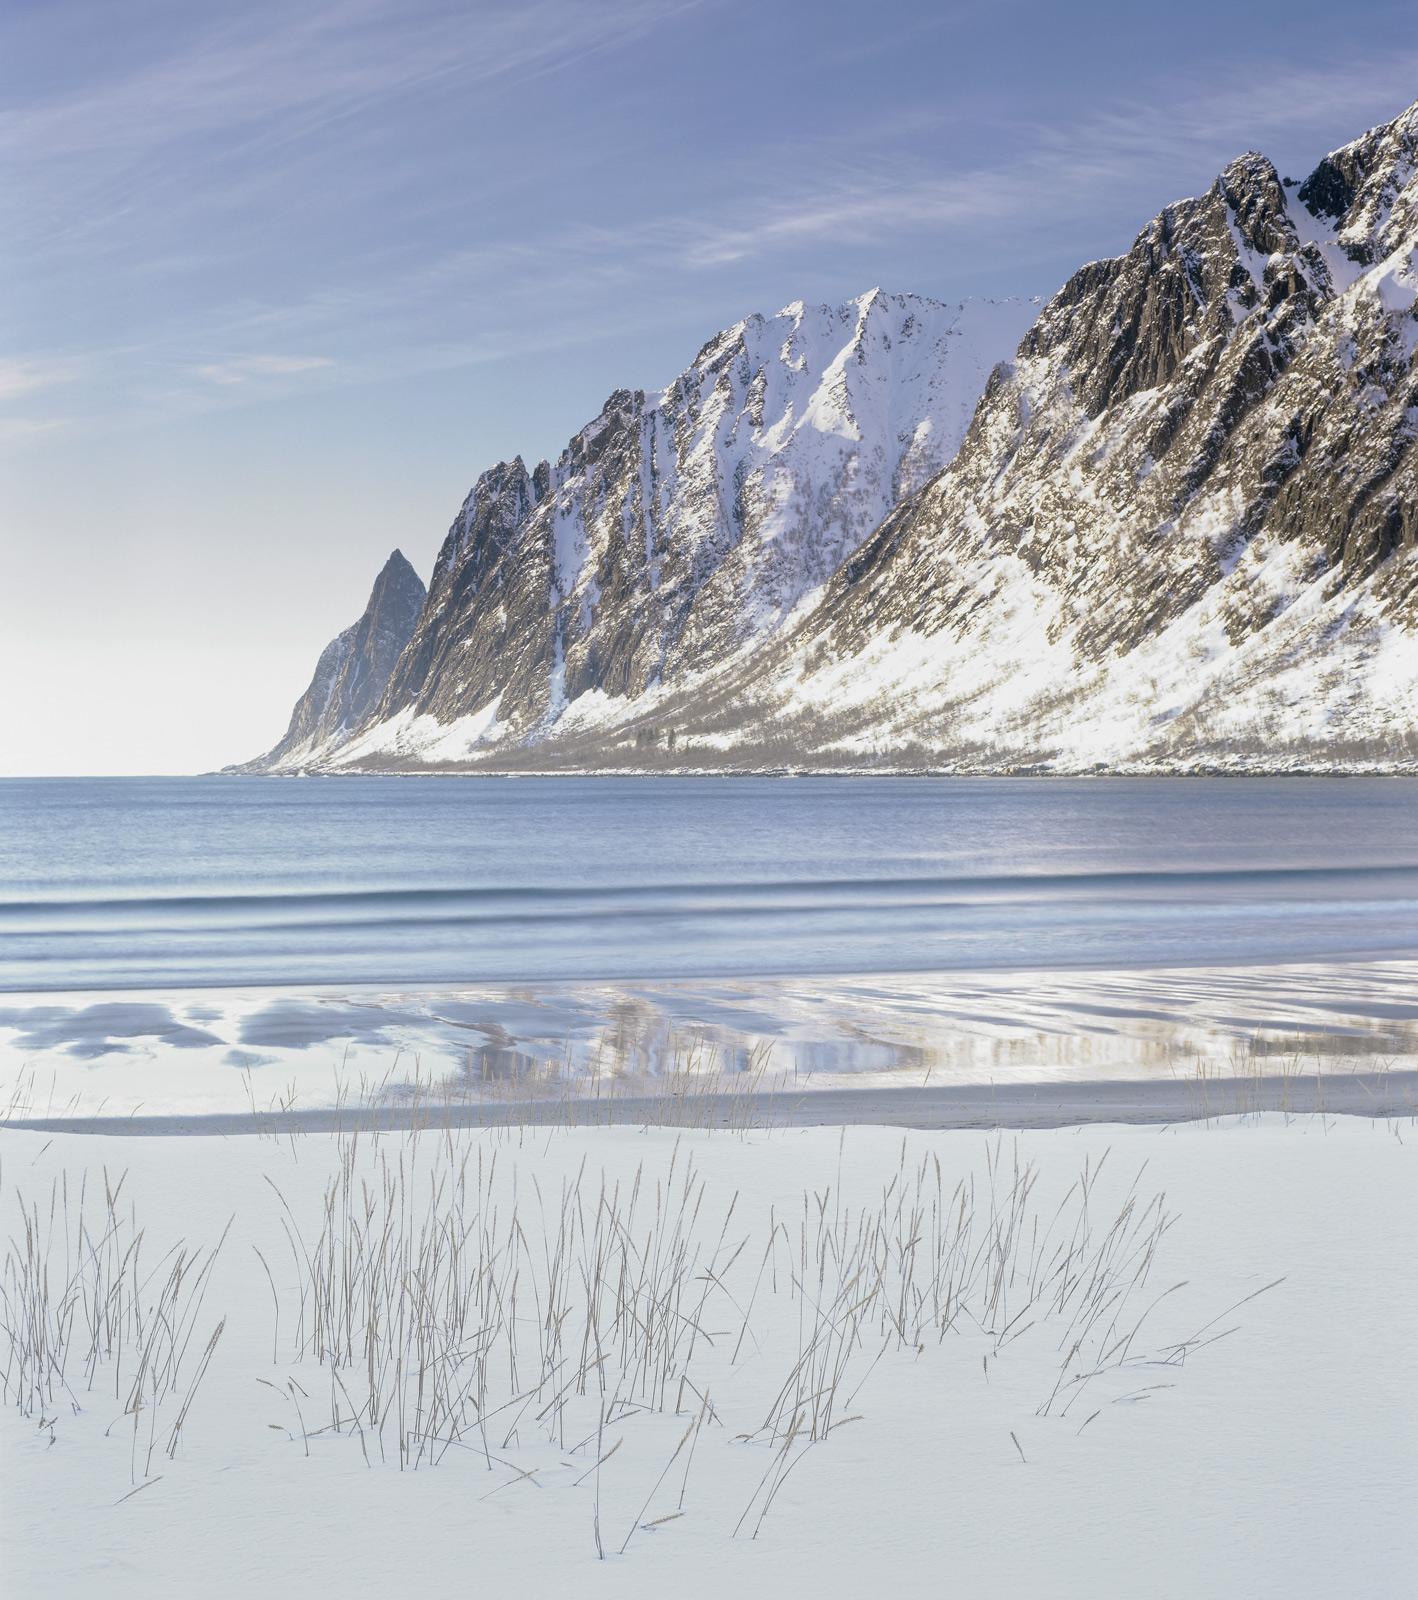 White Teeth, Ersfjord, Senja, Norway, rock, formation, Devils Teeth, white, gleaming, afternoon sun, snow, beach, grasse, photo